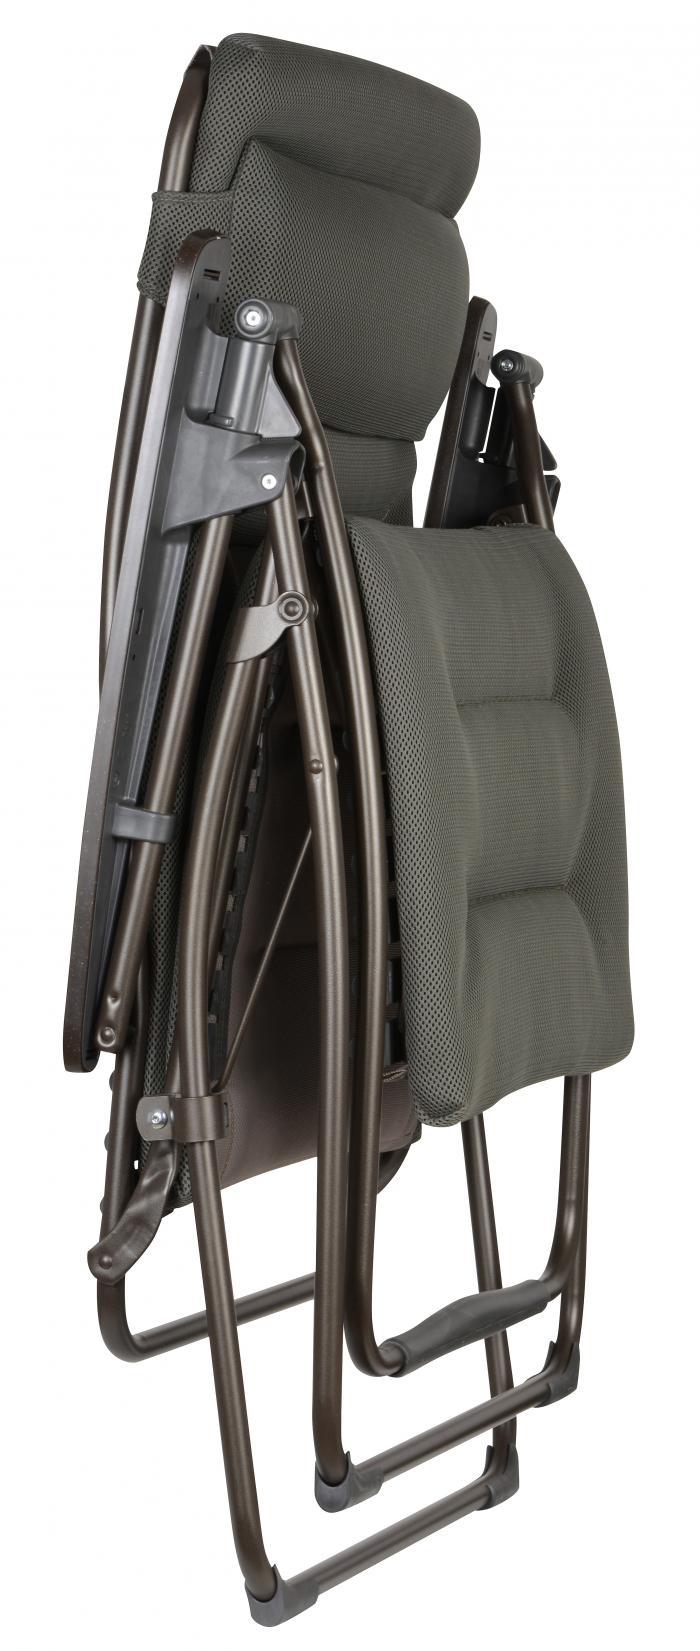 lafuma futura relaxsessel air comfort xl taupe 7057 gartenm bel. Black Bedroom Furniture Sets. Home Design Ideas